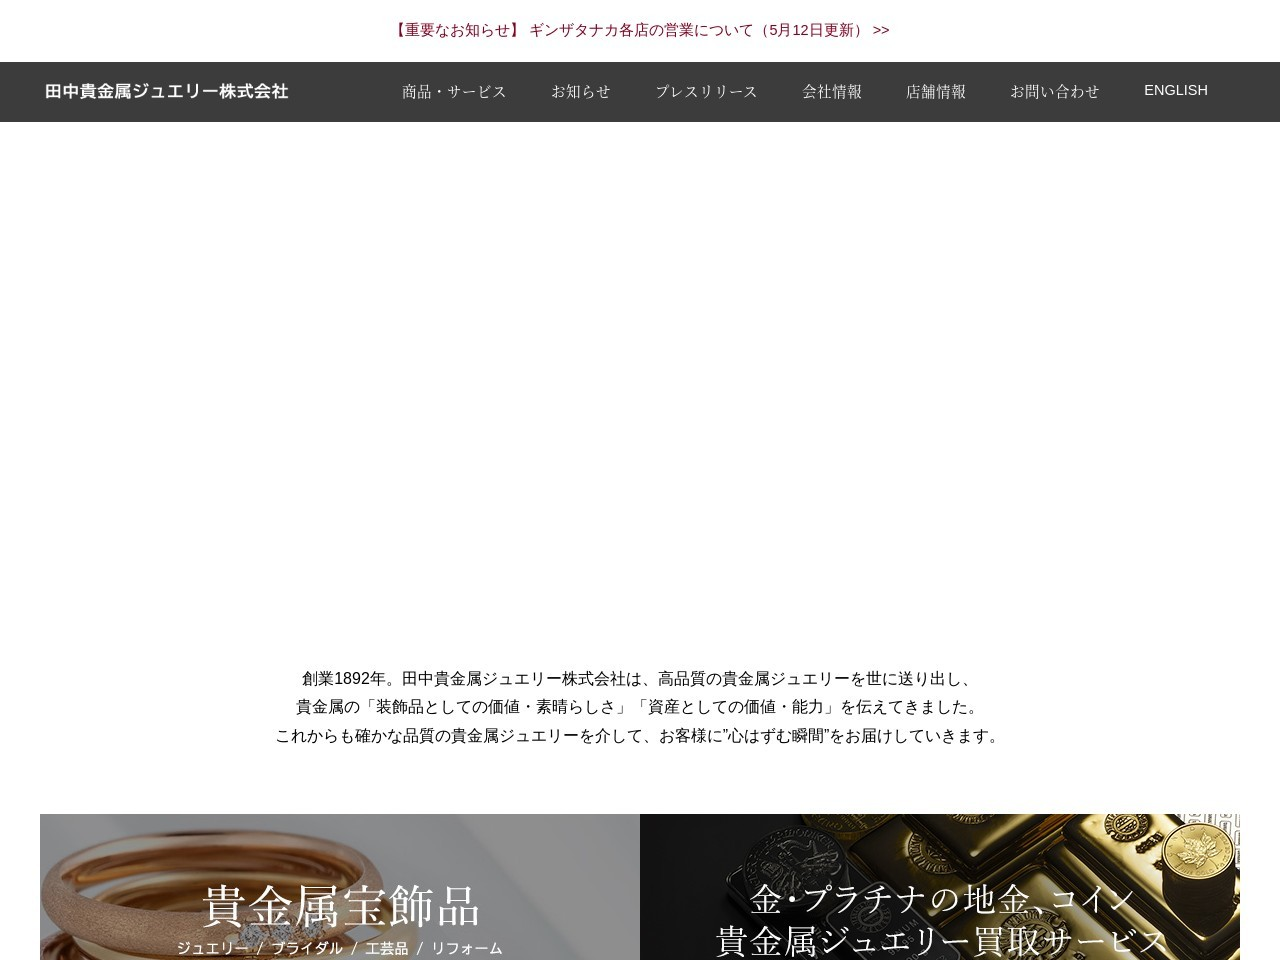 GINZA TANAKA | ジュエリー、結婚指輪・婚約指輪、工芸品、貴金属地金・コインの専門店